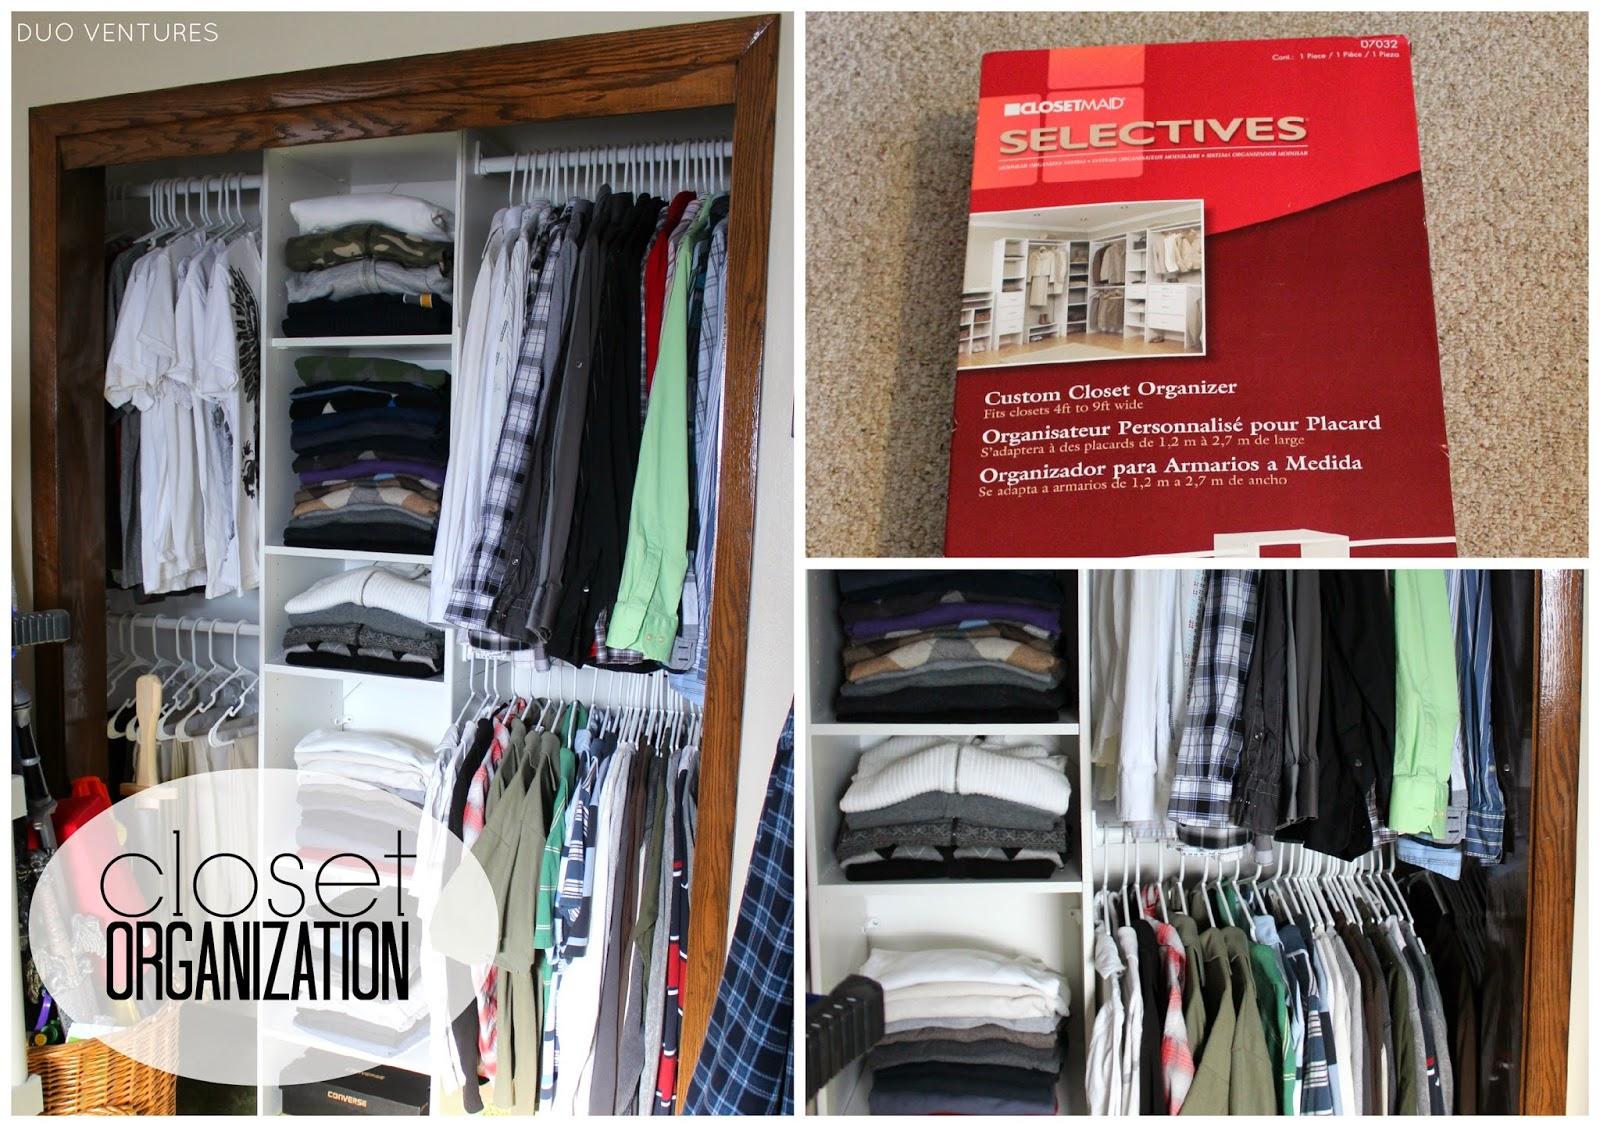 system pin organized wardrope ideas diy for cool final de closet organizador people